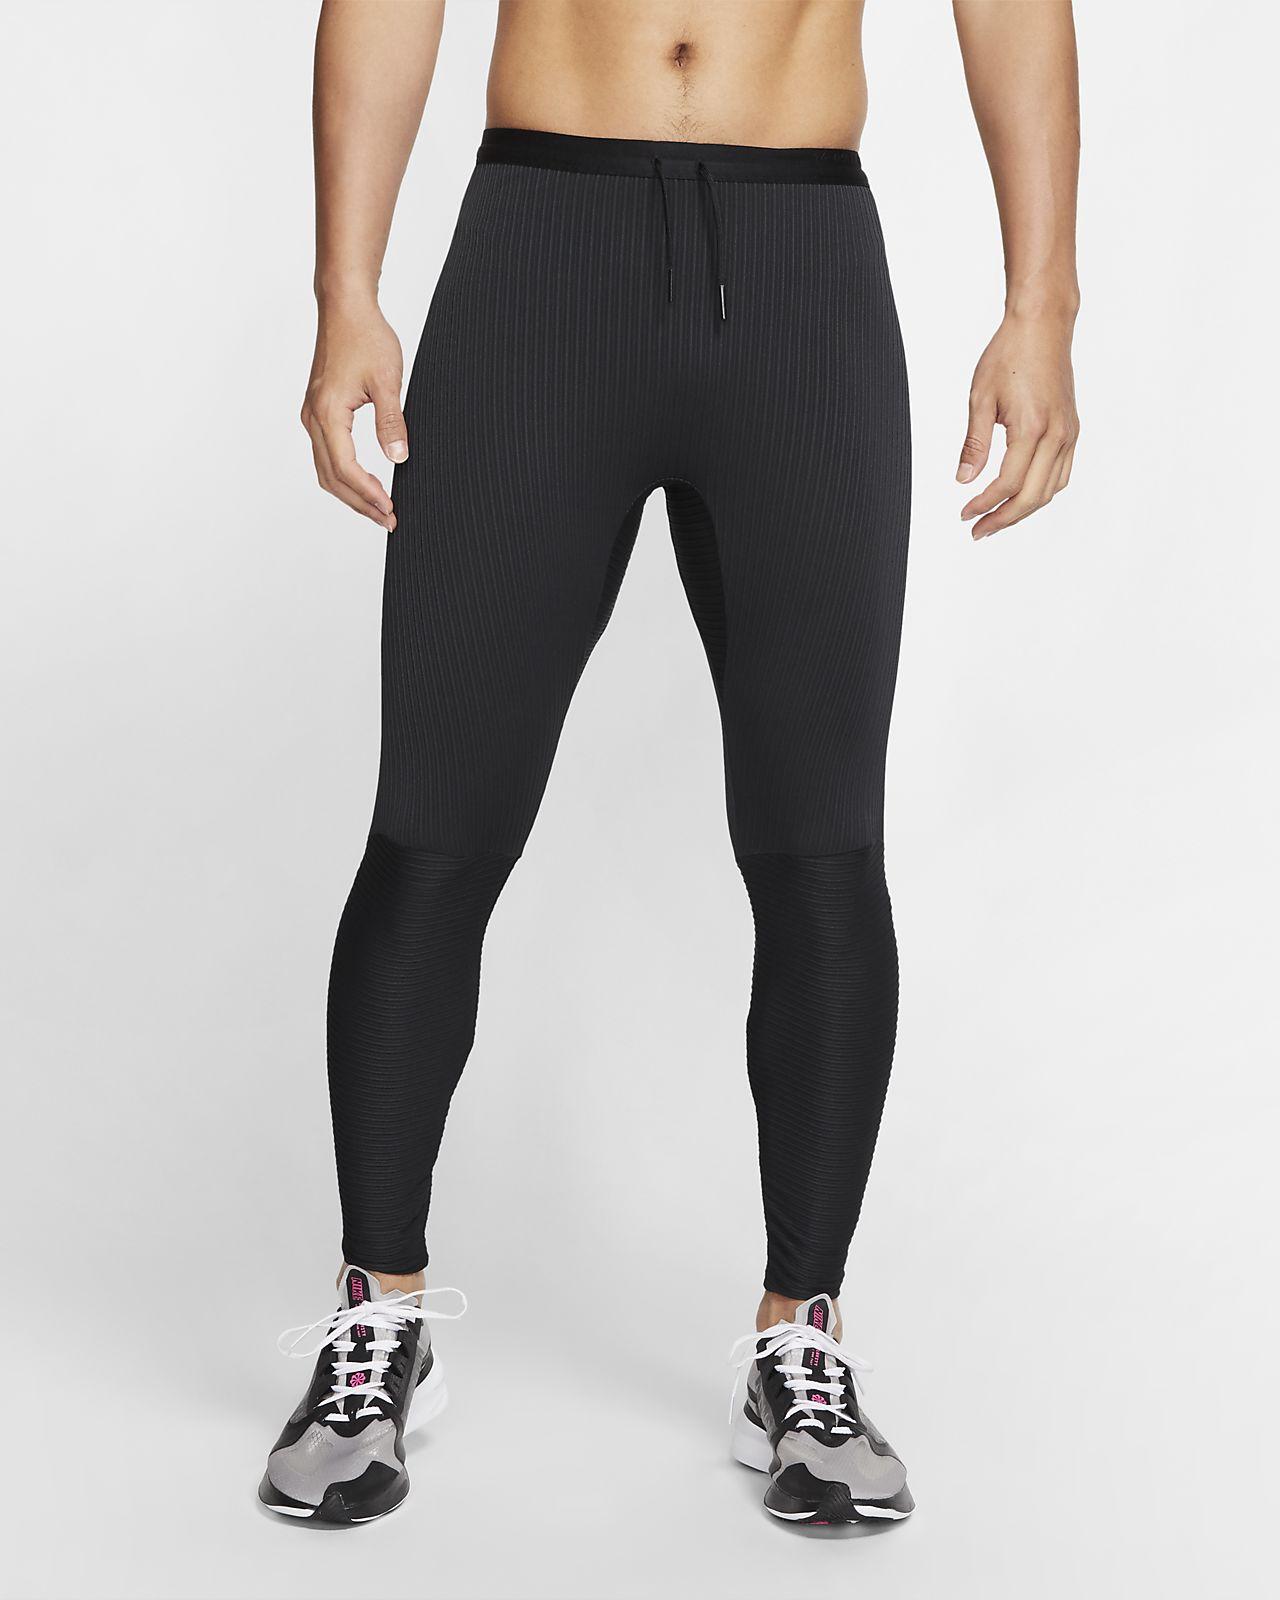 Tights de running Nike Tech Pack para homem